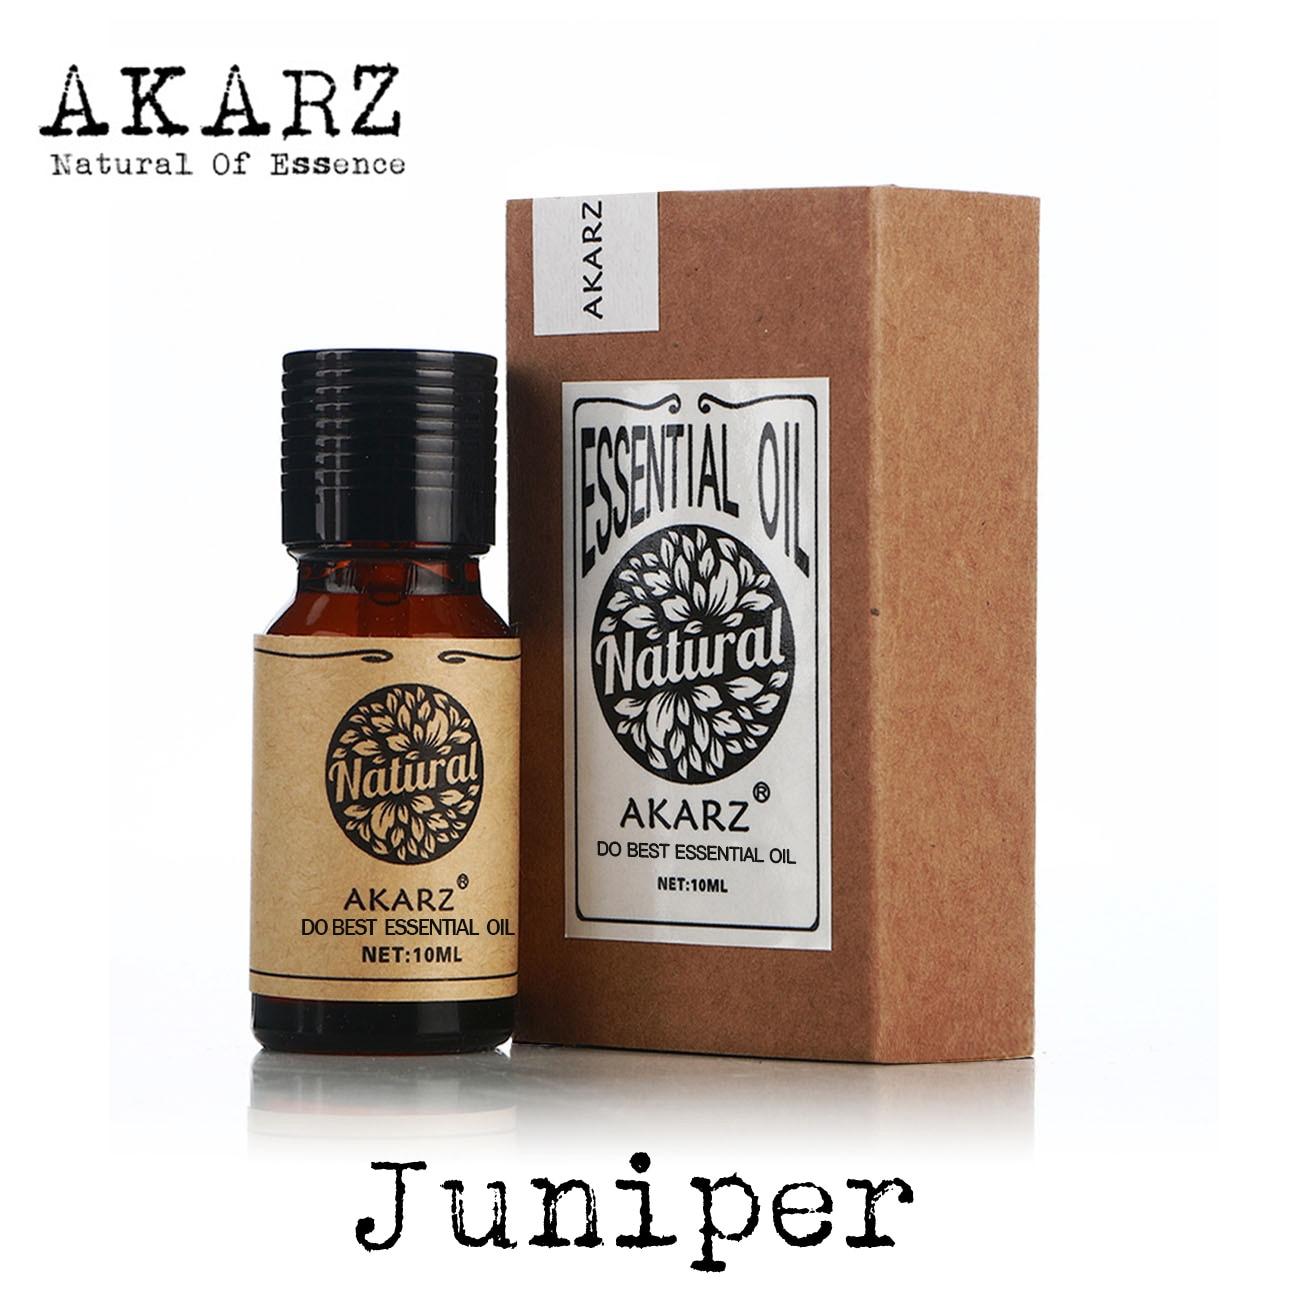 Juniper essential oil AKARZ brand natural Oiliness Cosmetics Candle Soap Scents Making DIY odorant raw material Juniper oil